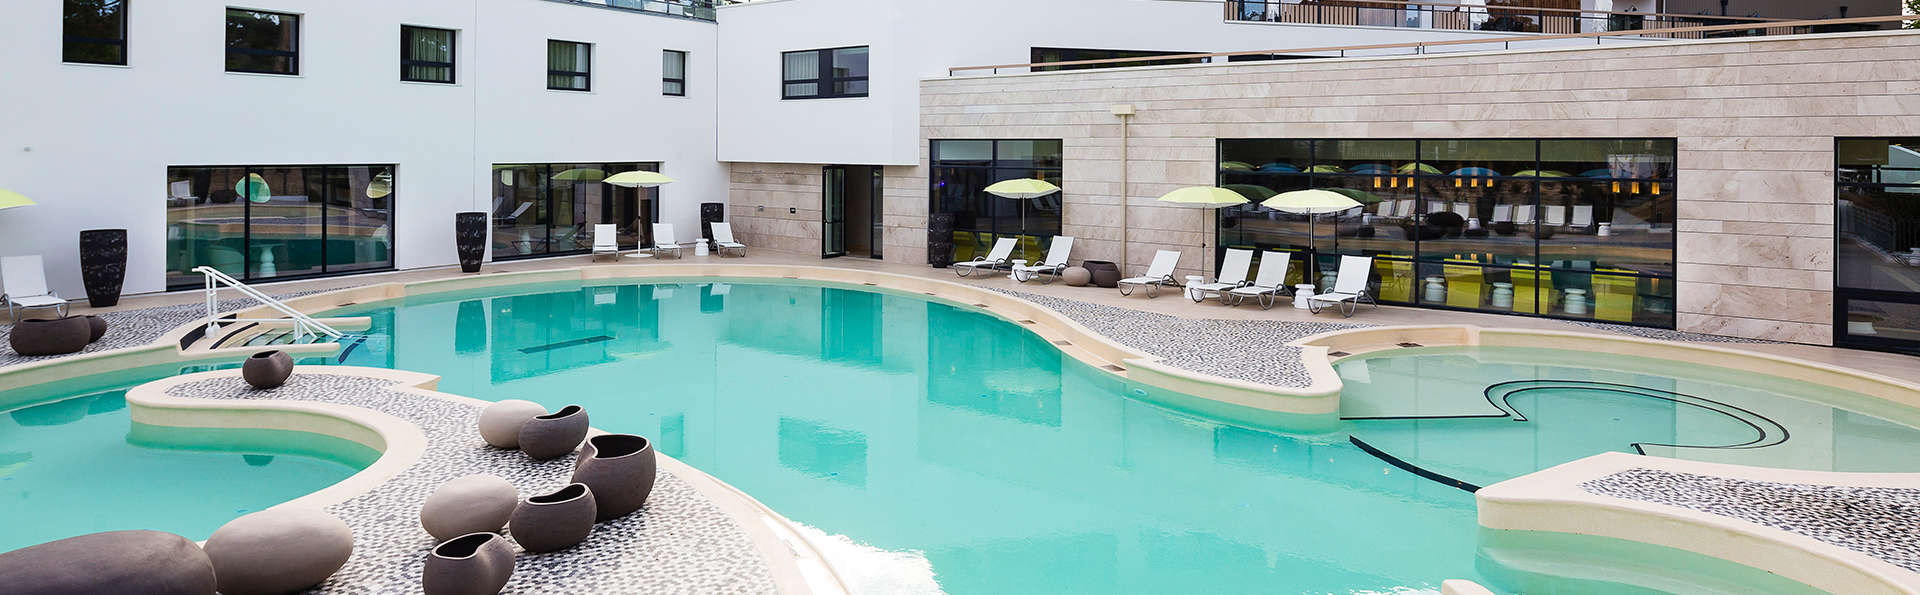 Hôtel les bains d'Arguin & Spa by Thalazur - edit_pool6.jpg